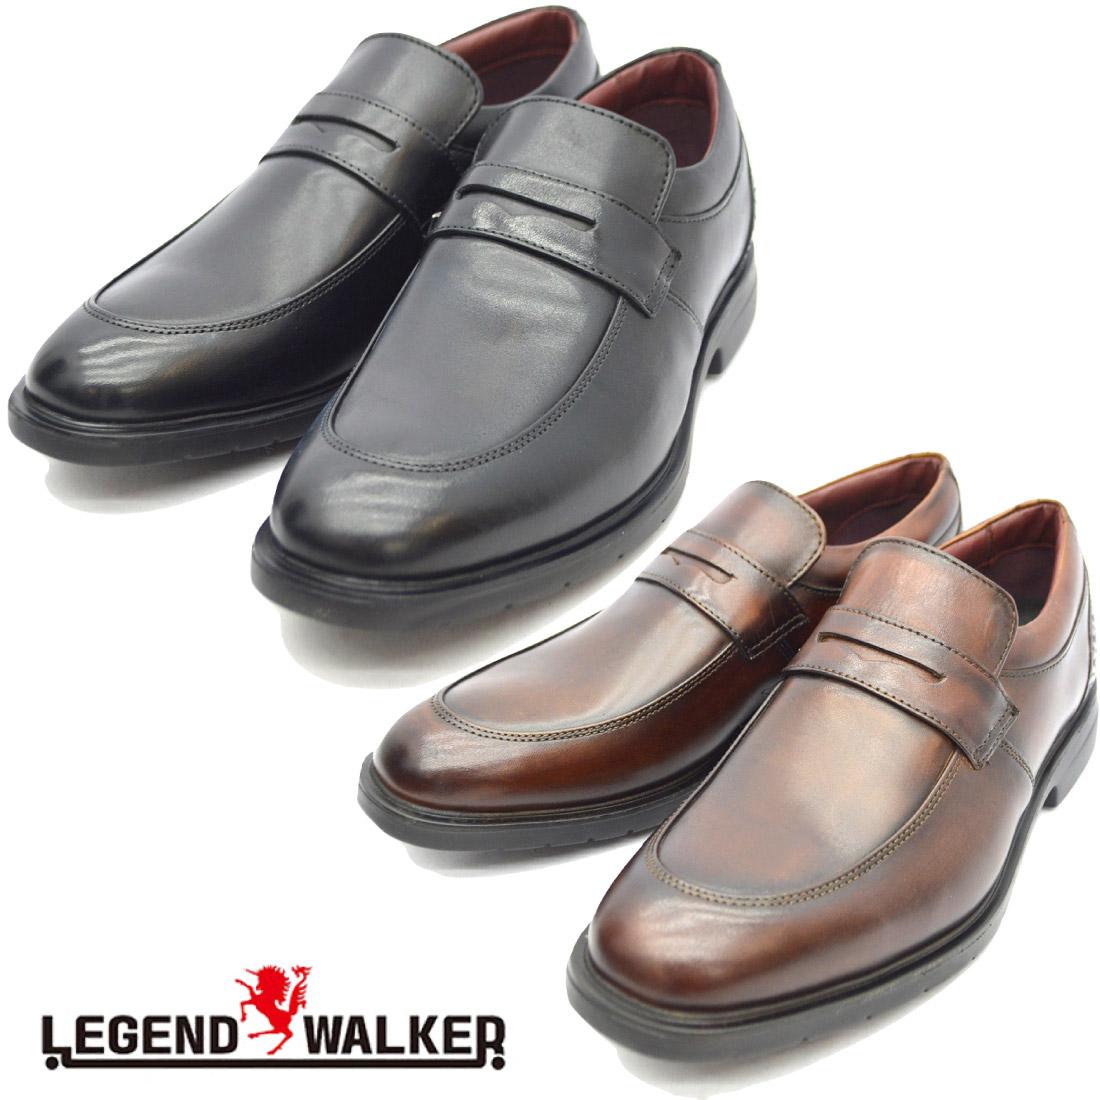 Legend Walker レジェンドウォーカー スリッポン ビジネス シューズ LW002 【nesh】 【新品】